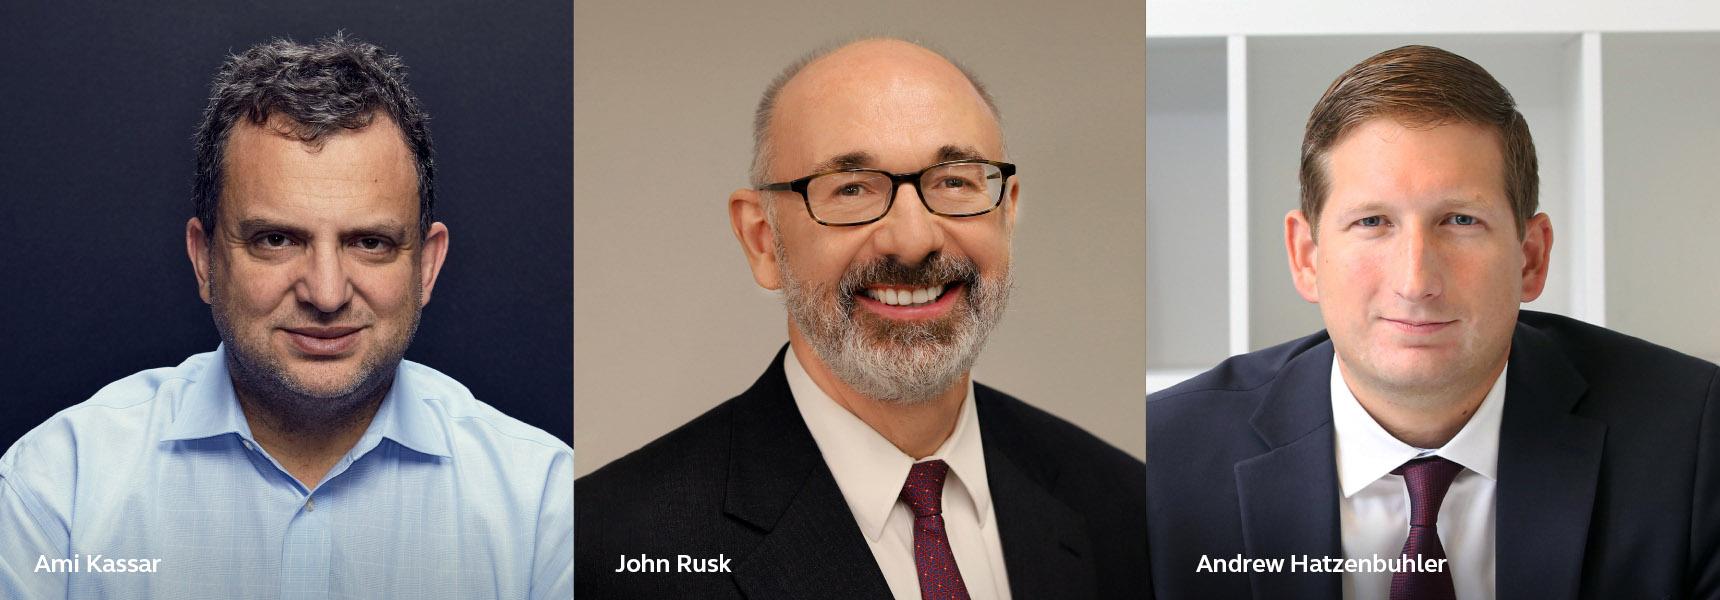 Photo of Ami Kassar, John Rusk, and Andrew Hatzenbuhler.